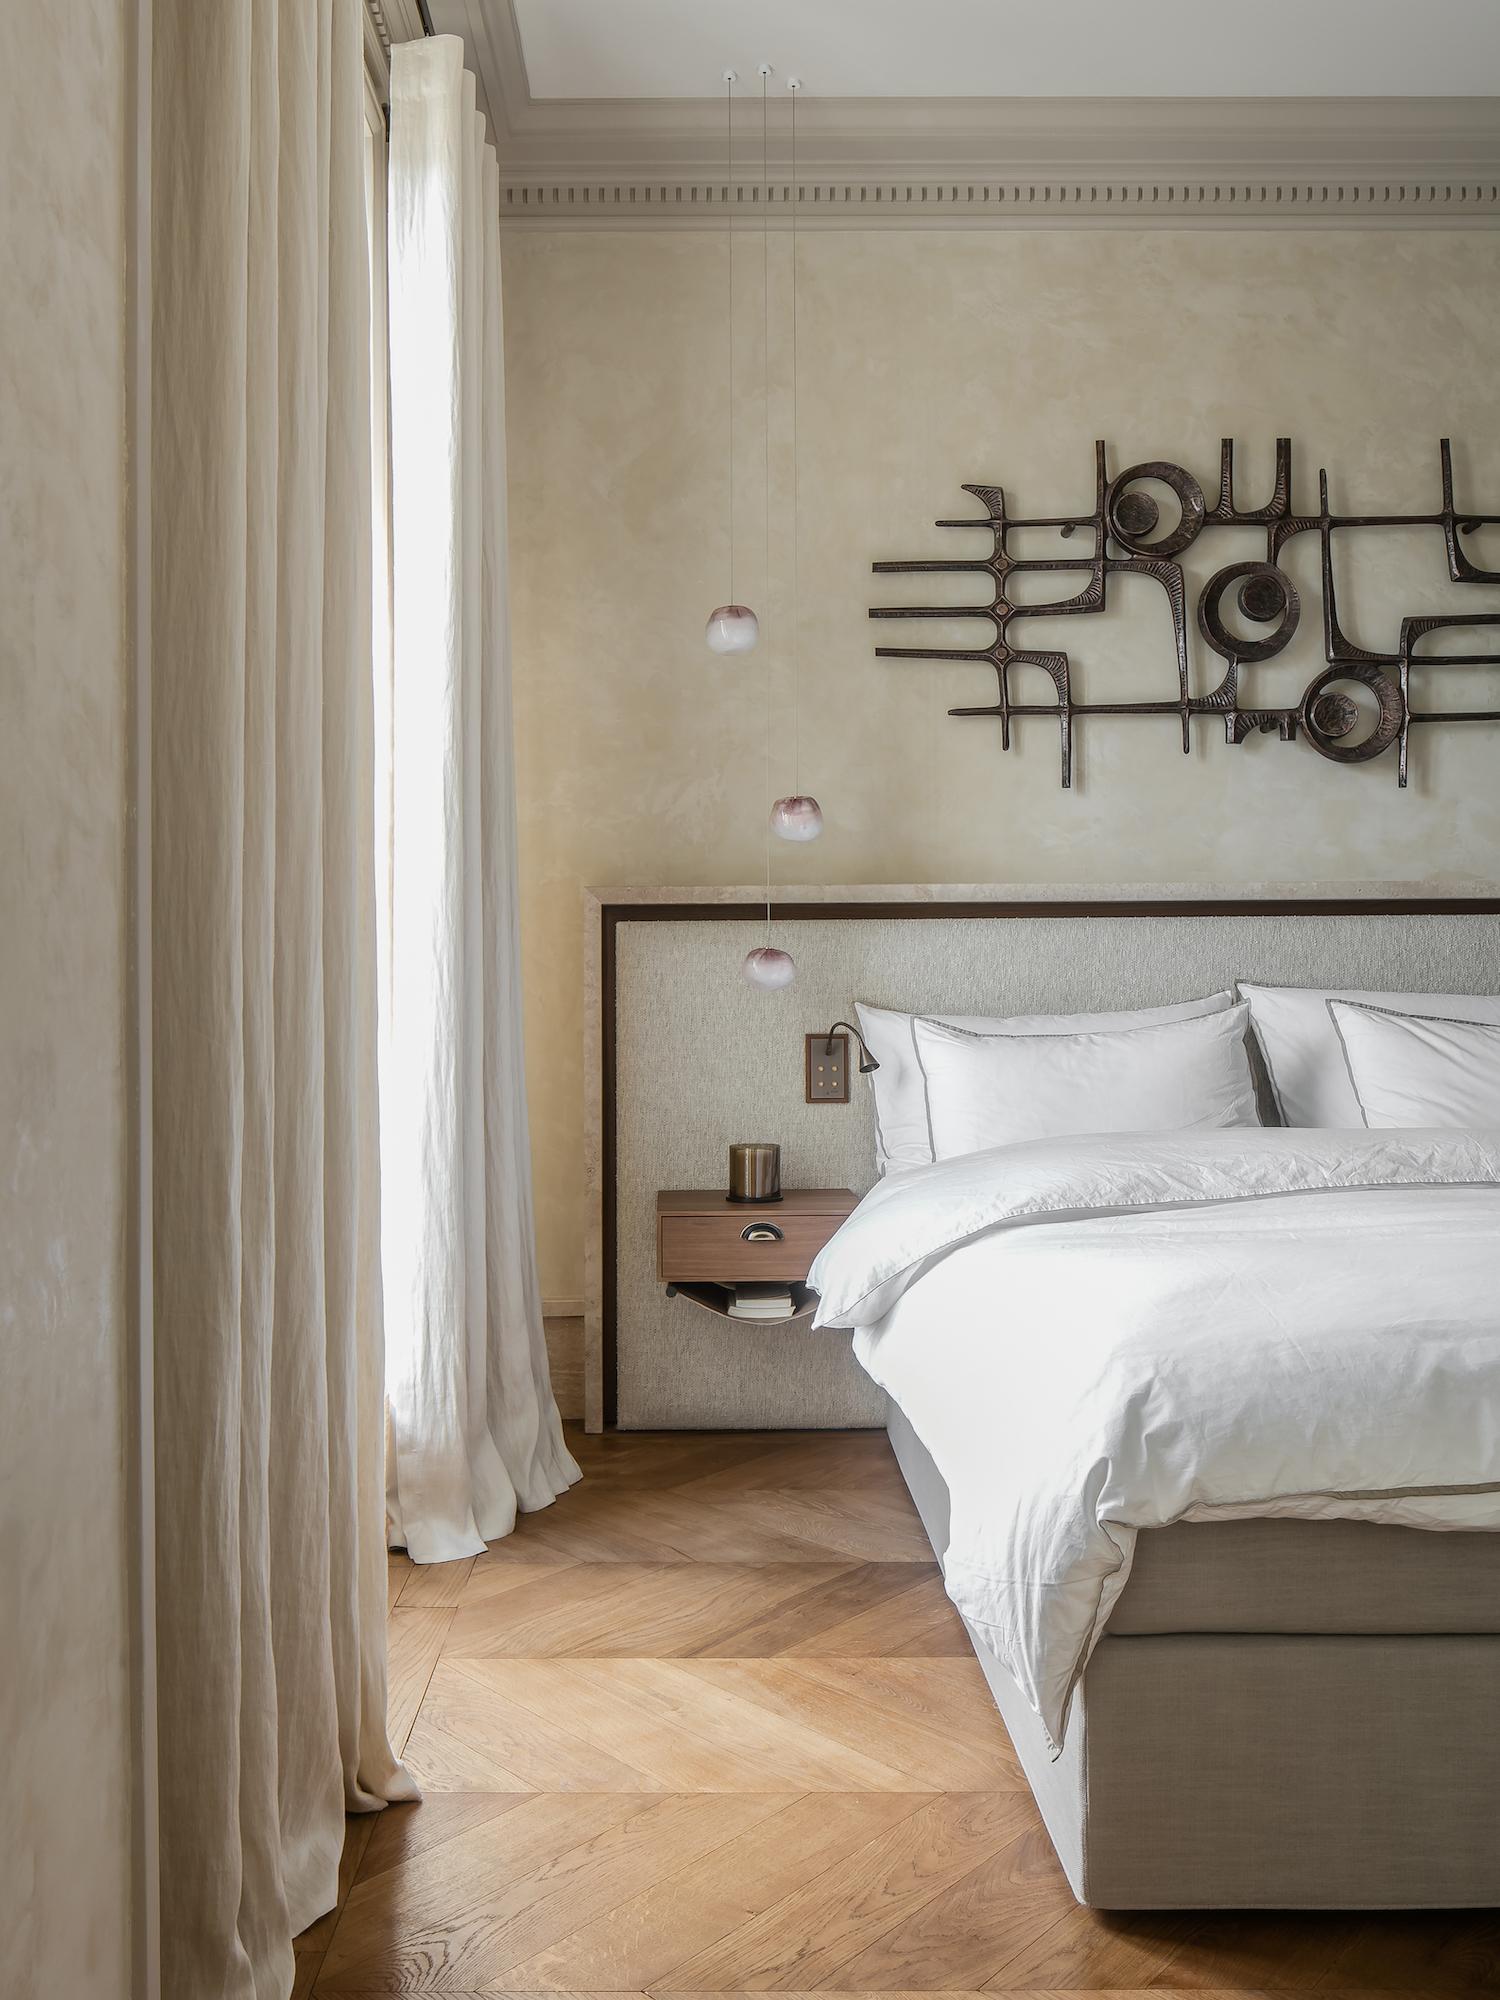 est living villa ketamine caprini pellerin architects 02